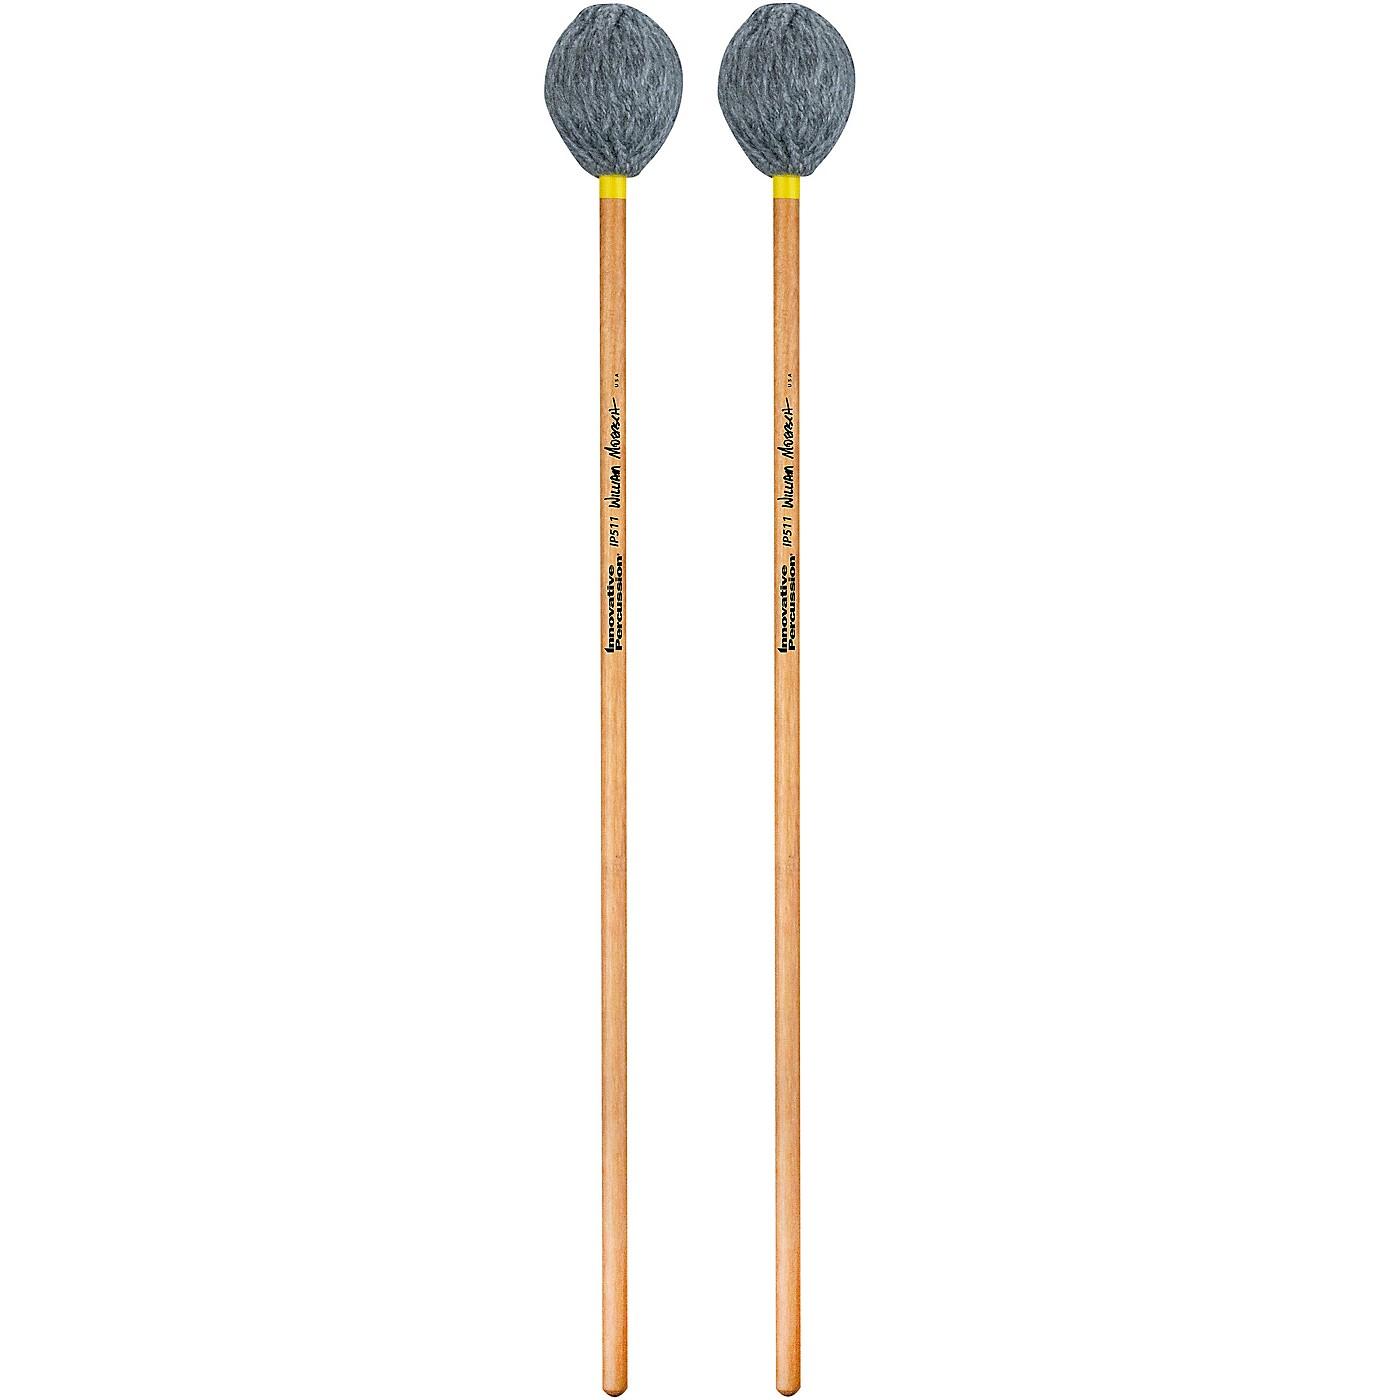 Innovative Percussion William Moersch Series Birch Handle Marimba Mallets thumbnail